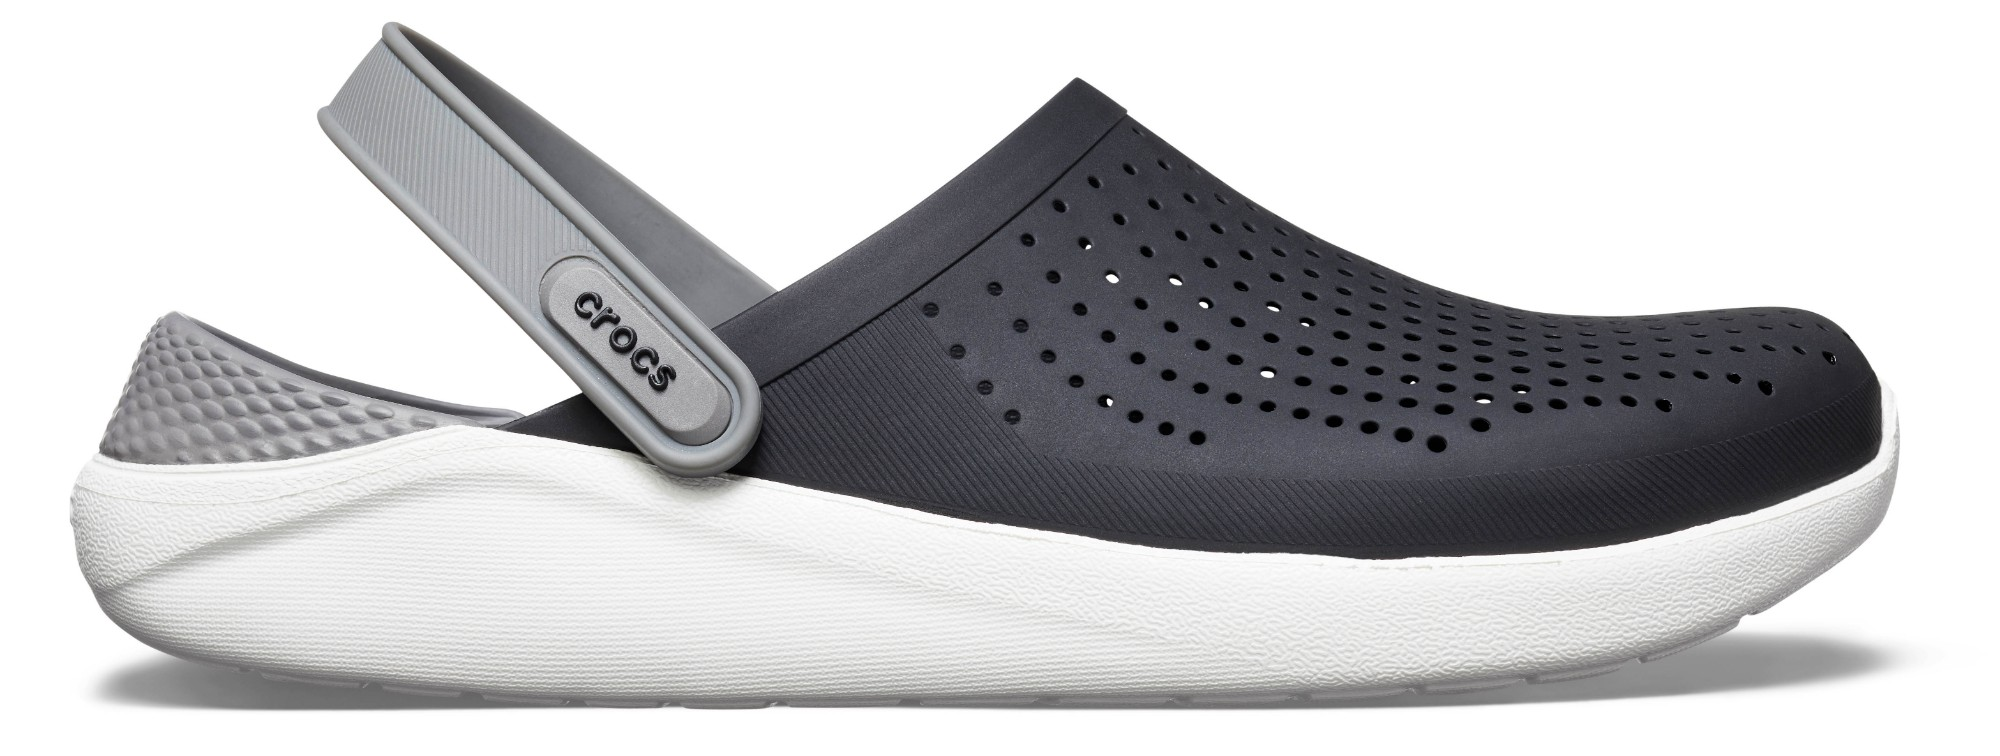 Crocs™ LiteRide Clog Black/Smoke 36,5